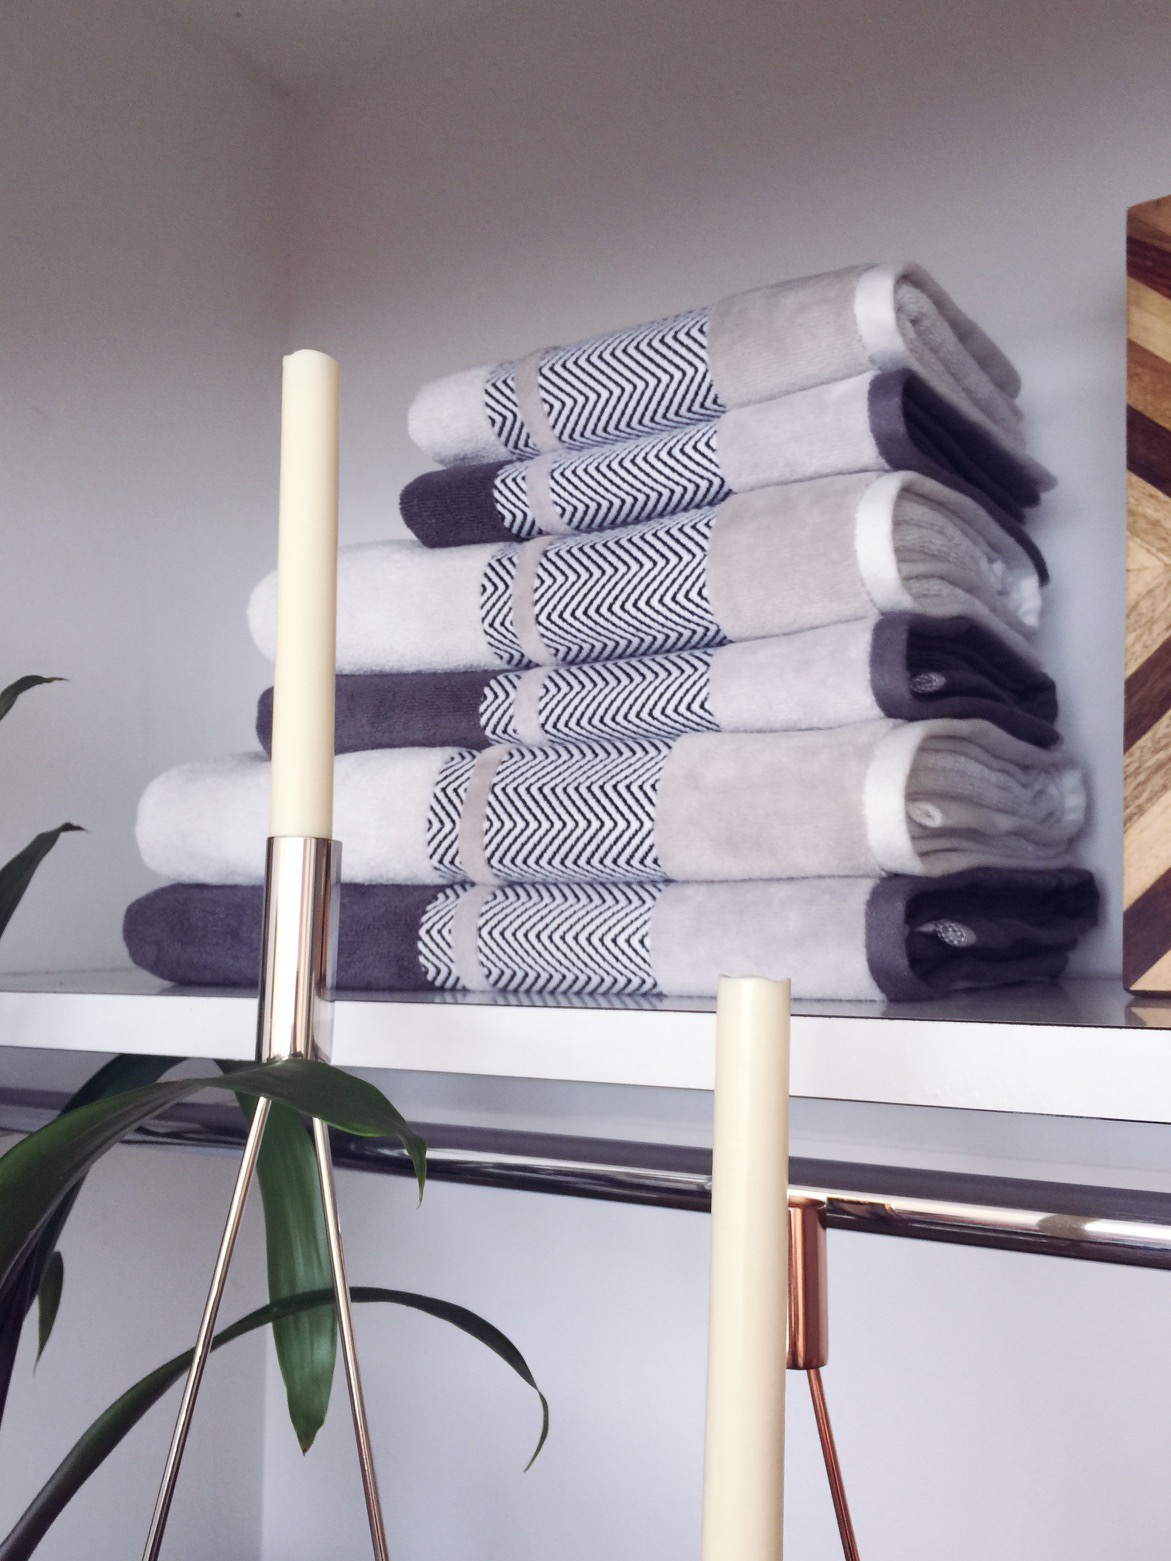 monochrome towels